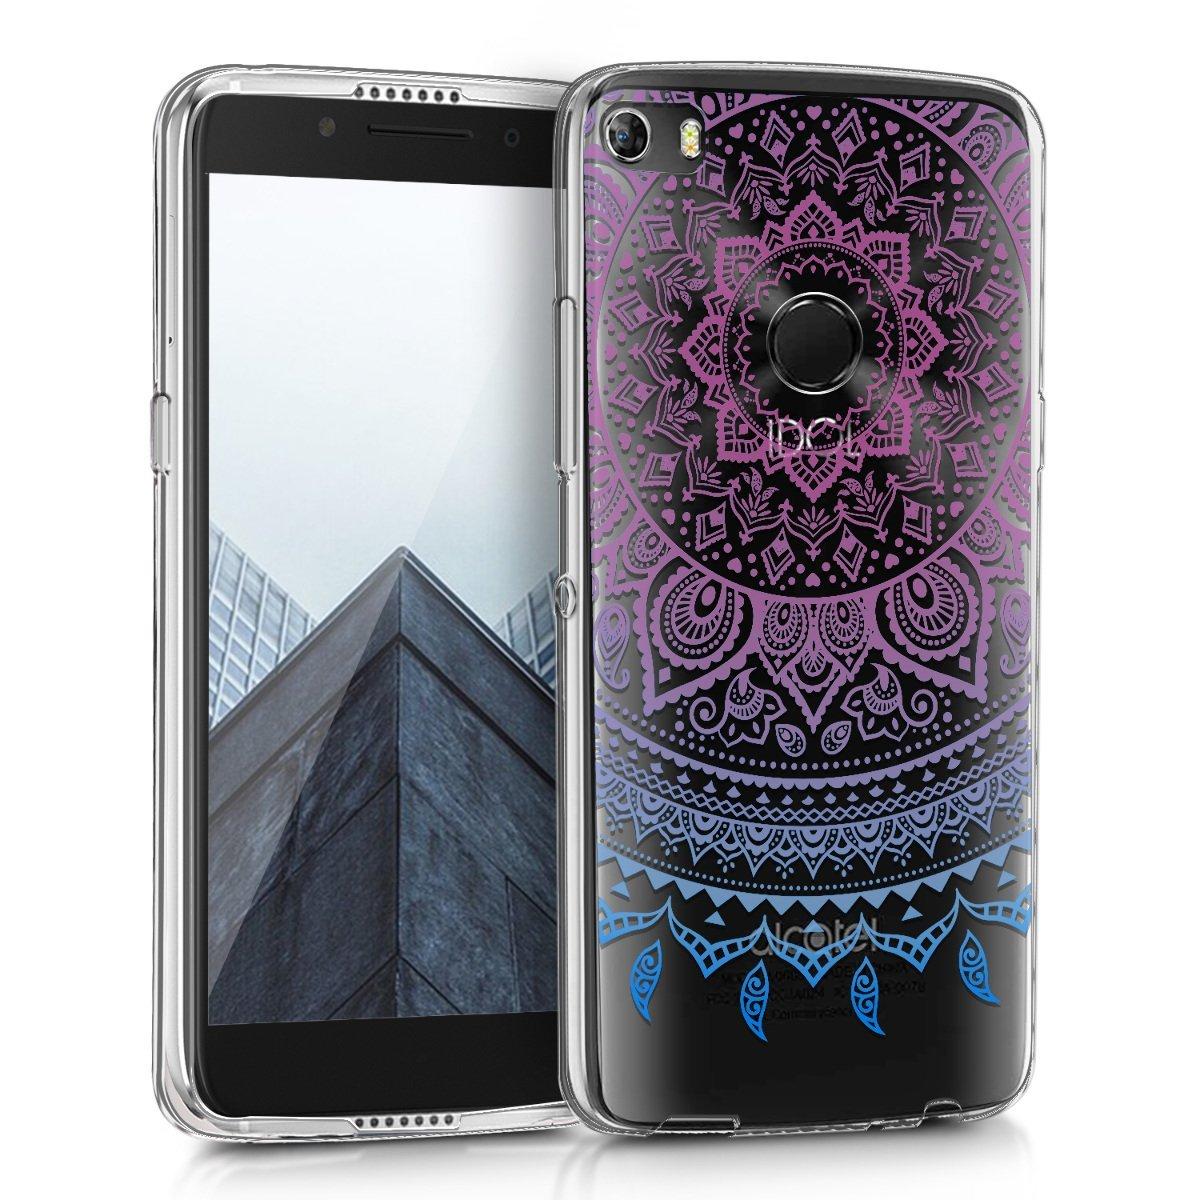 KW Θήκη Σιλικόνης Alcatel Idol 5s - Design Indian Sun (43178.01) θήκες κινητών